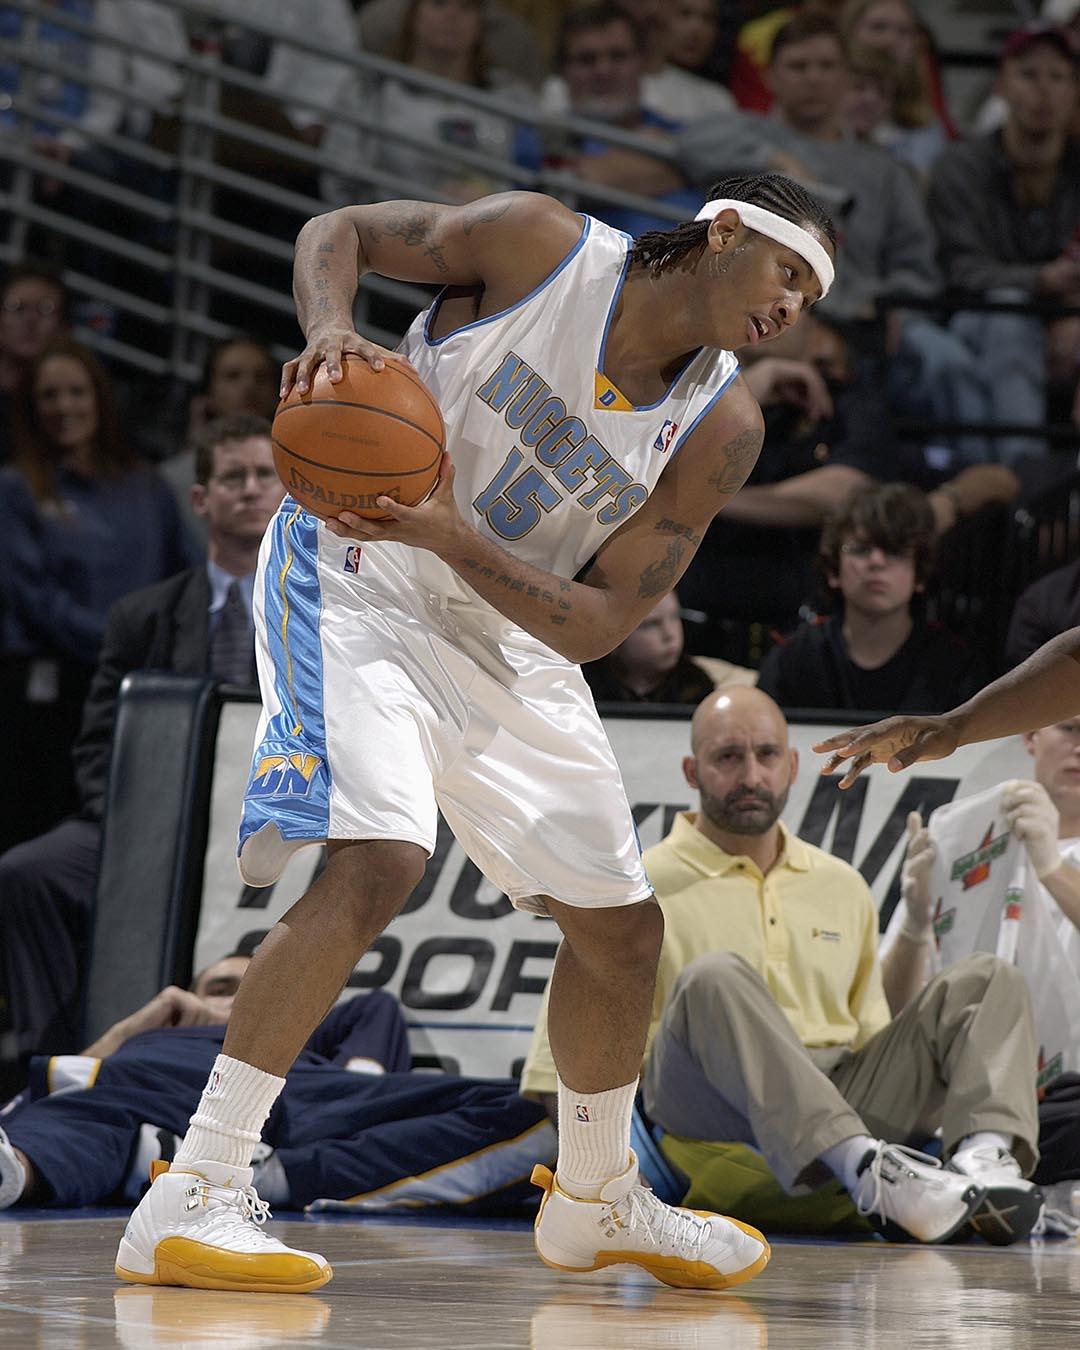 Carmelo Anthony + Air Jordan 12 PE